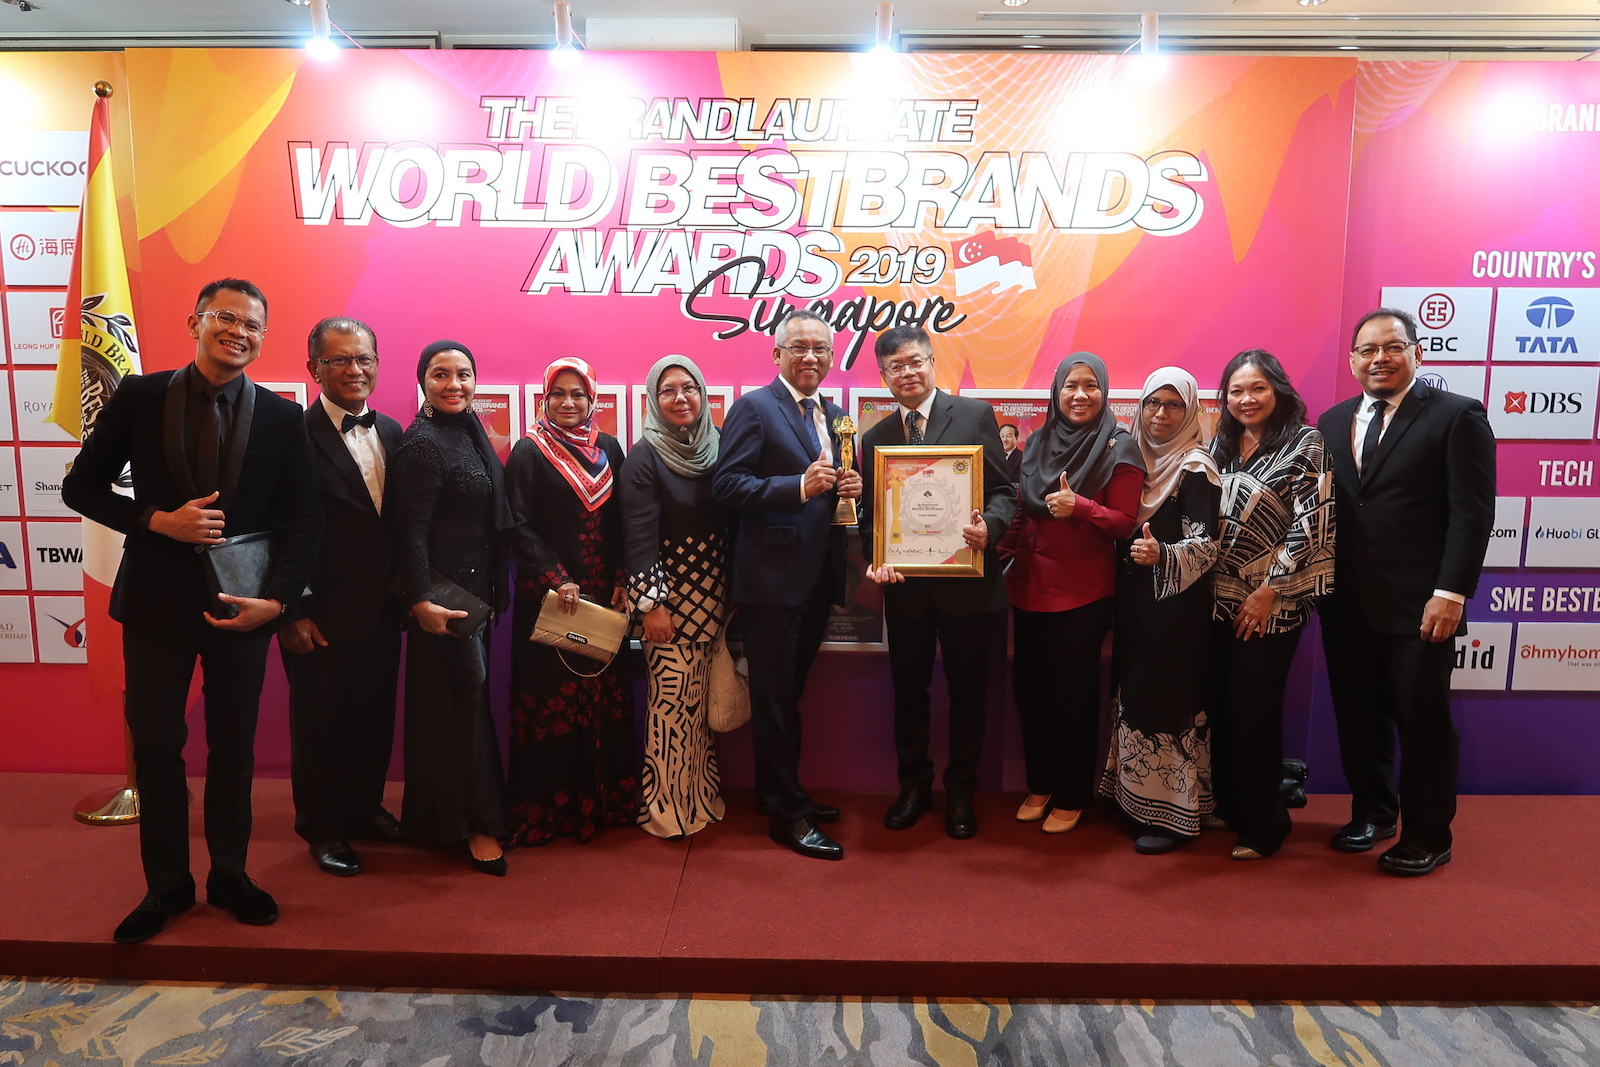 31 October 2019: THE BRANDLAUREATE WORLD BESTBRANDS AWARDS 2019 3